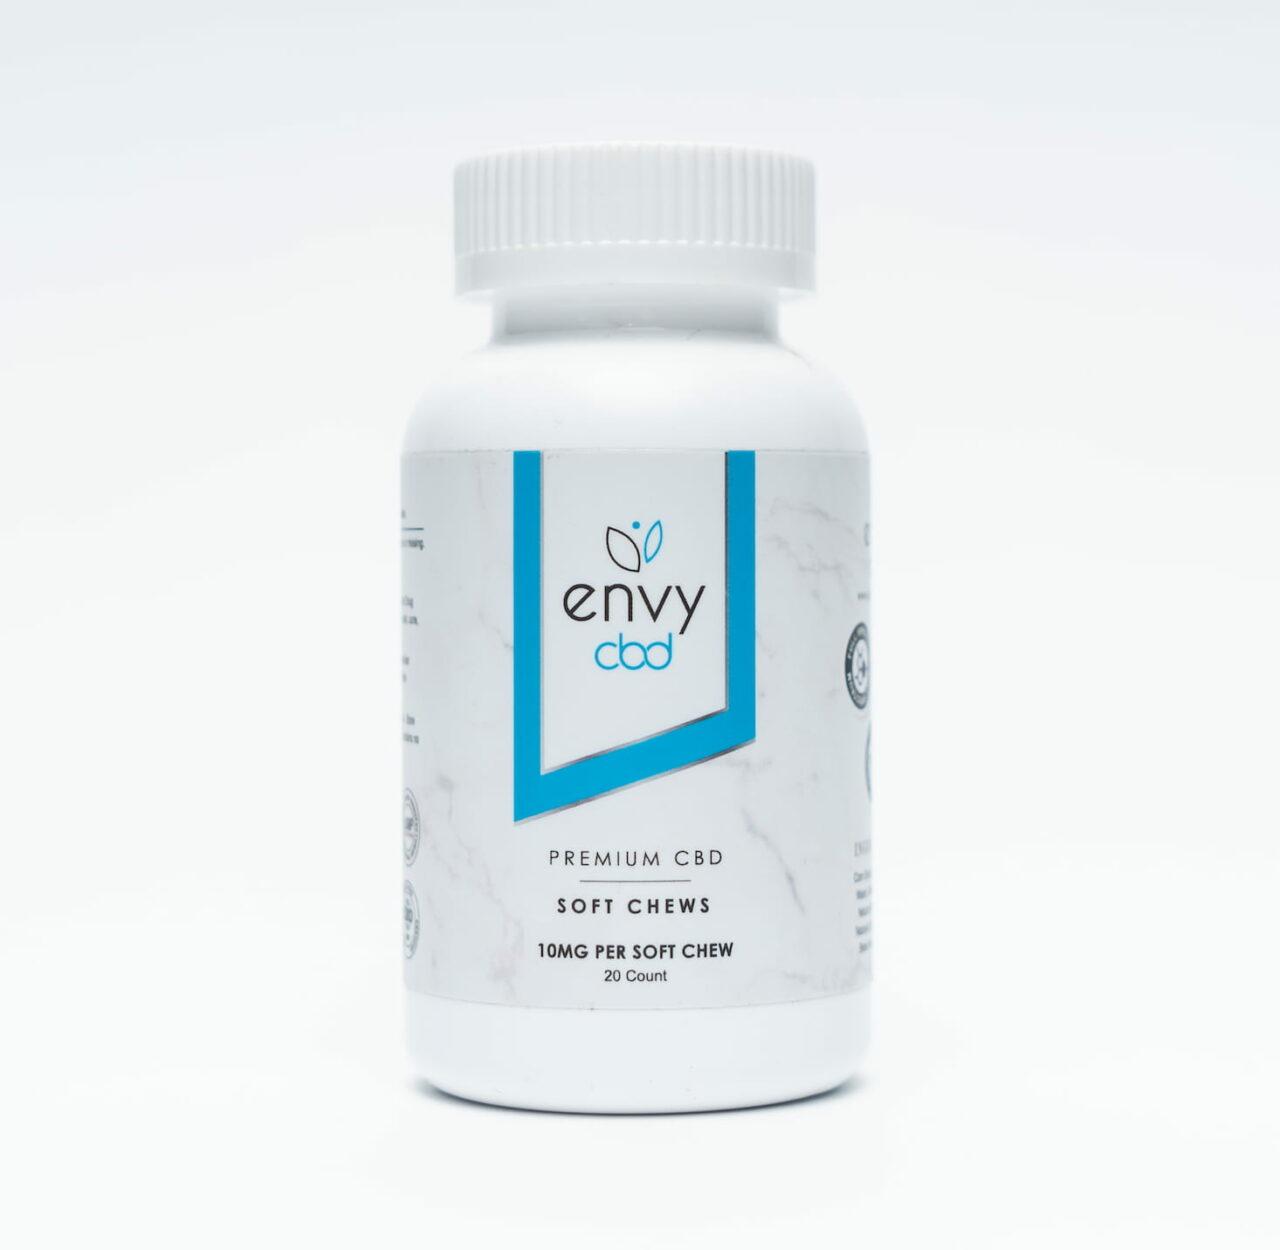 envy-cbd-cbd-gummies-20-count-200mg-of-cbd